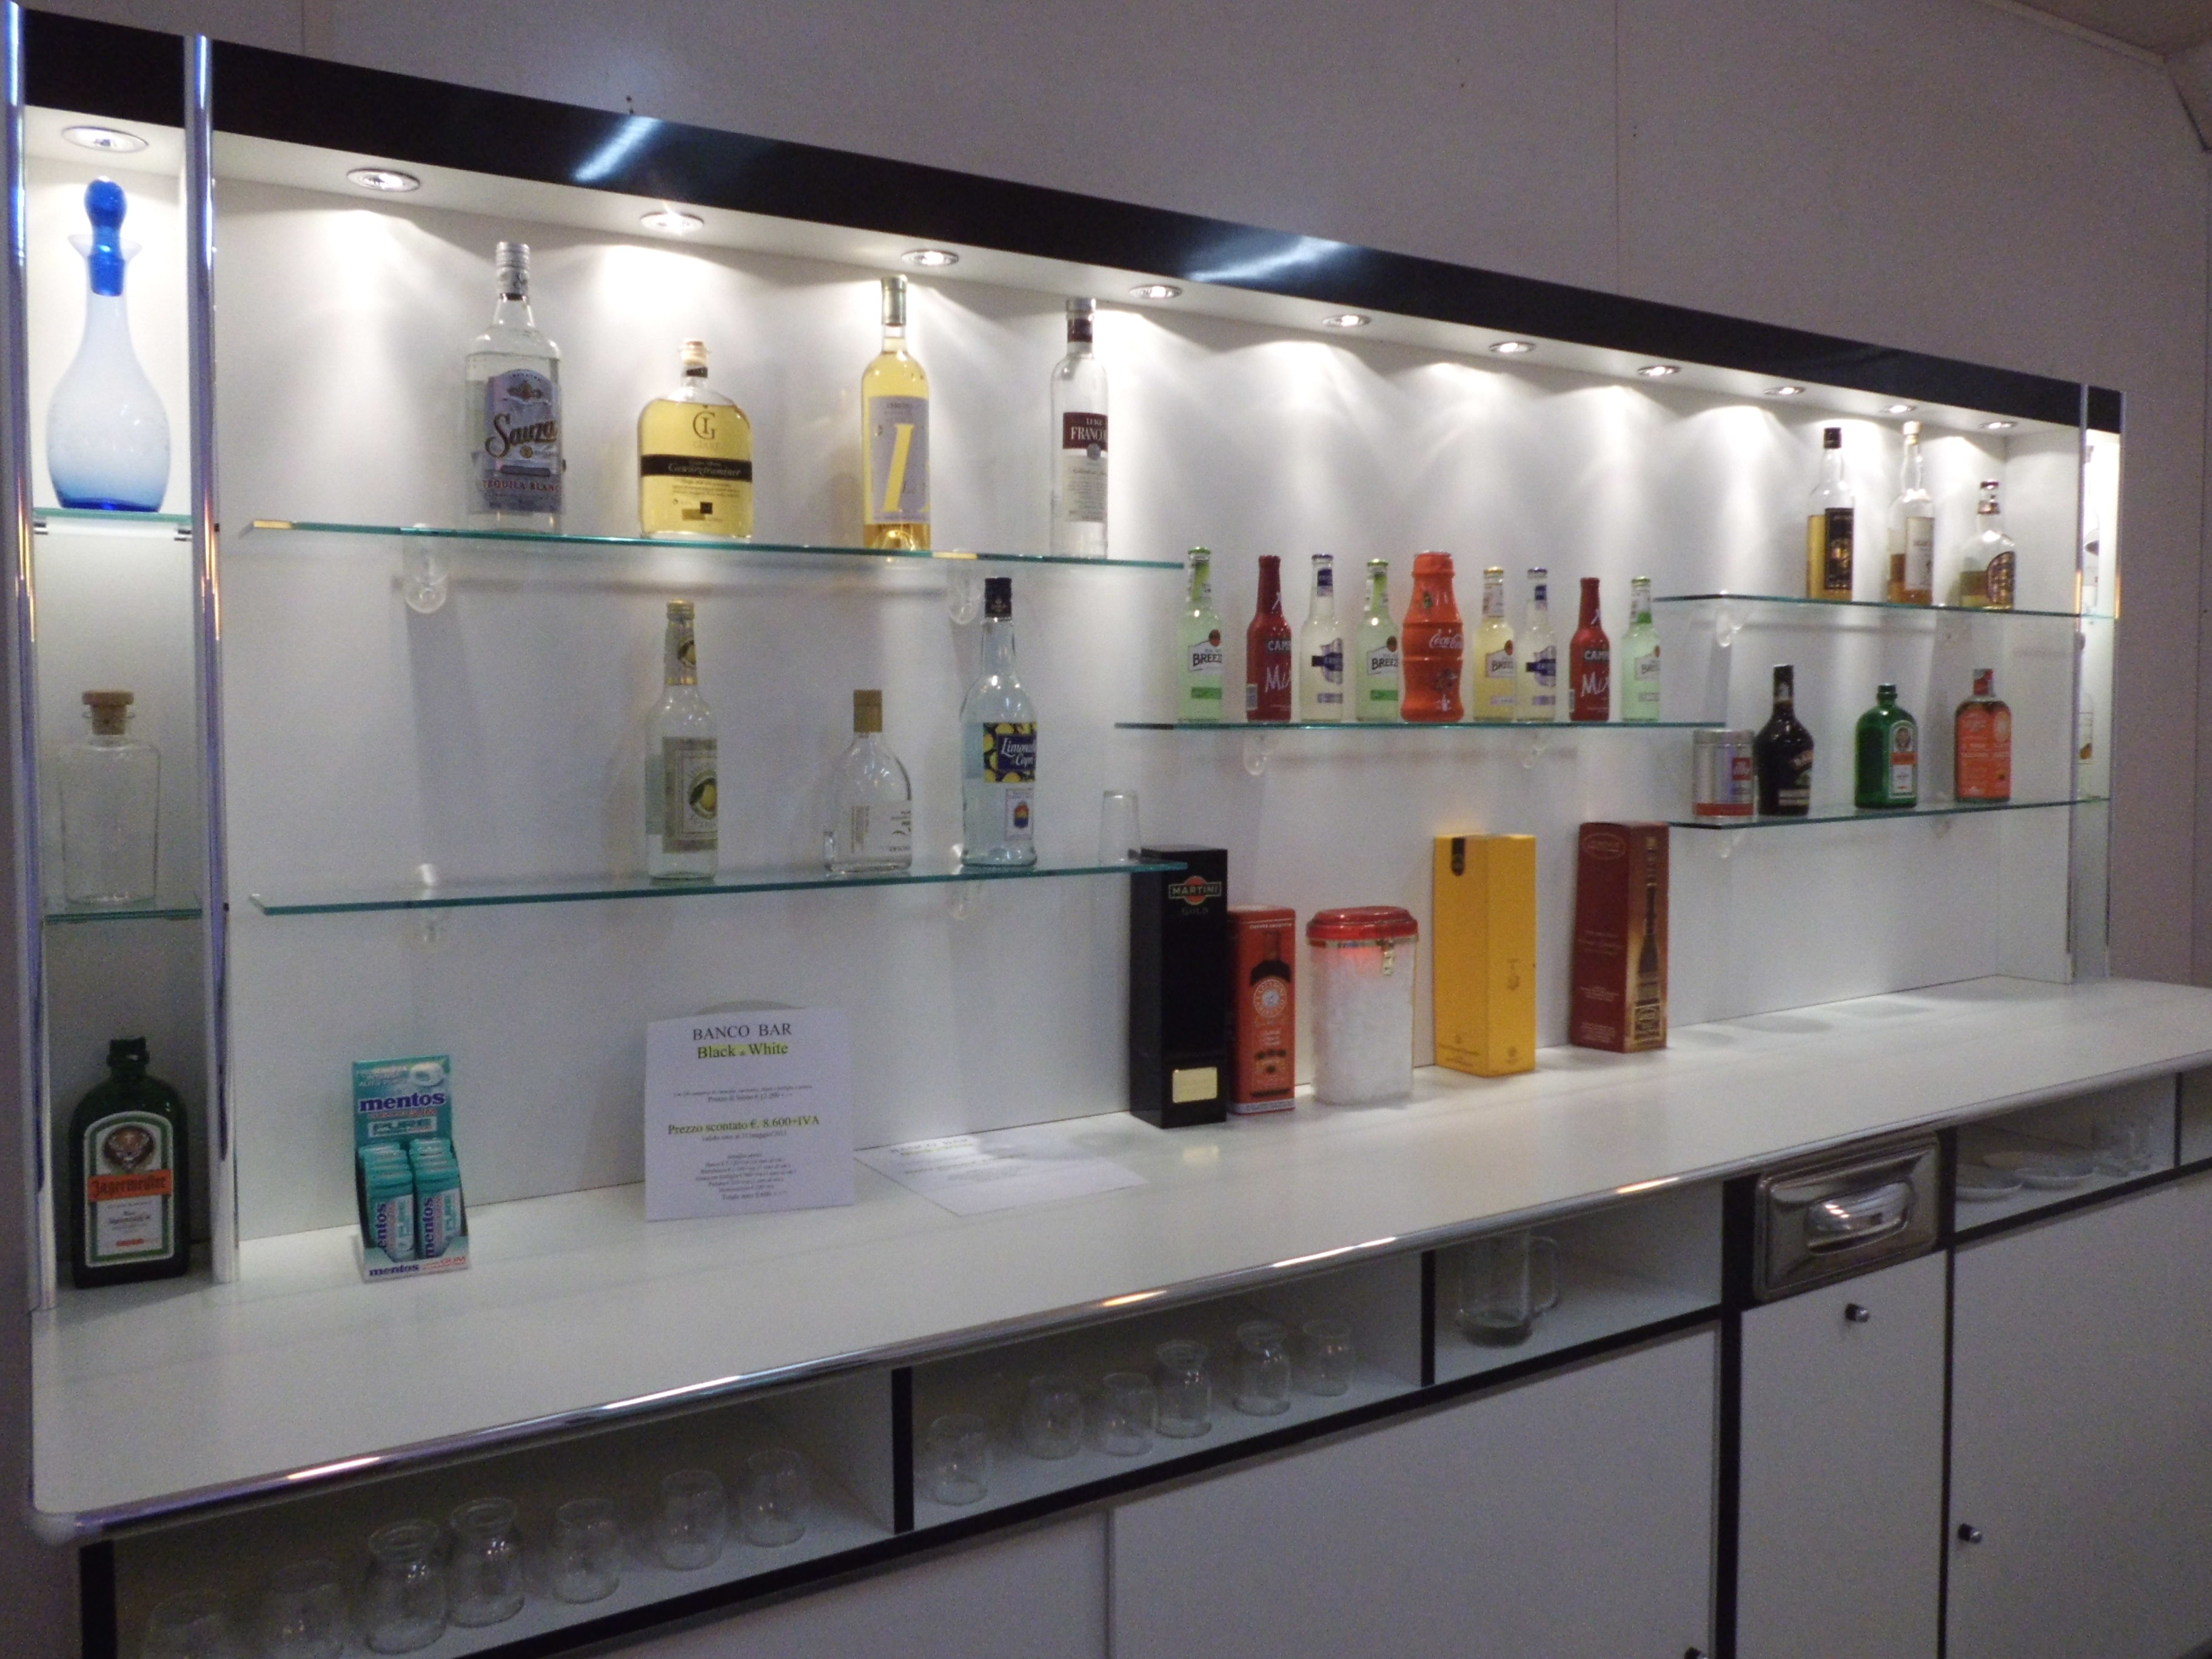 Bar in PROMOZIONE, Banchi Frigo, Banconi Bar, Banchi Bar Grezzi ...